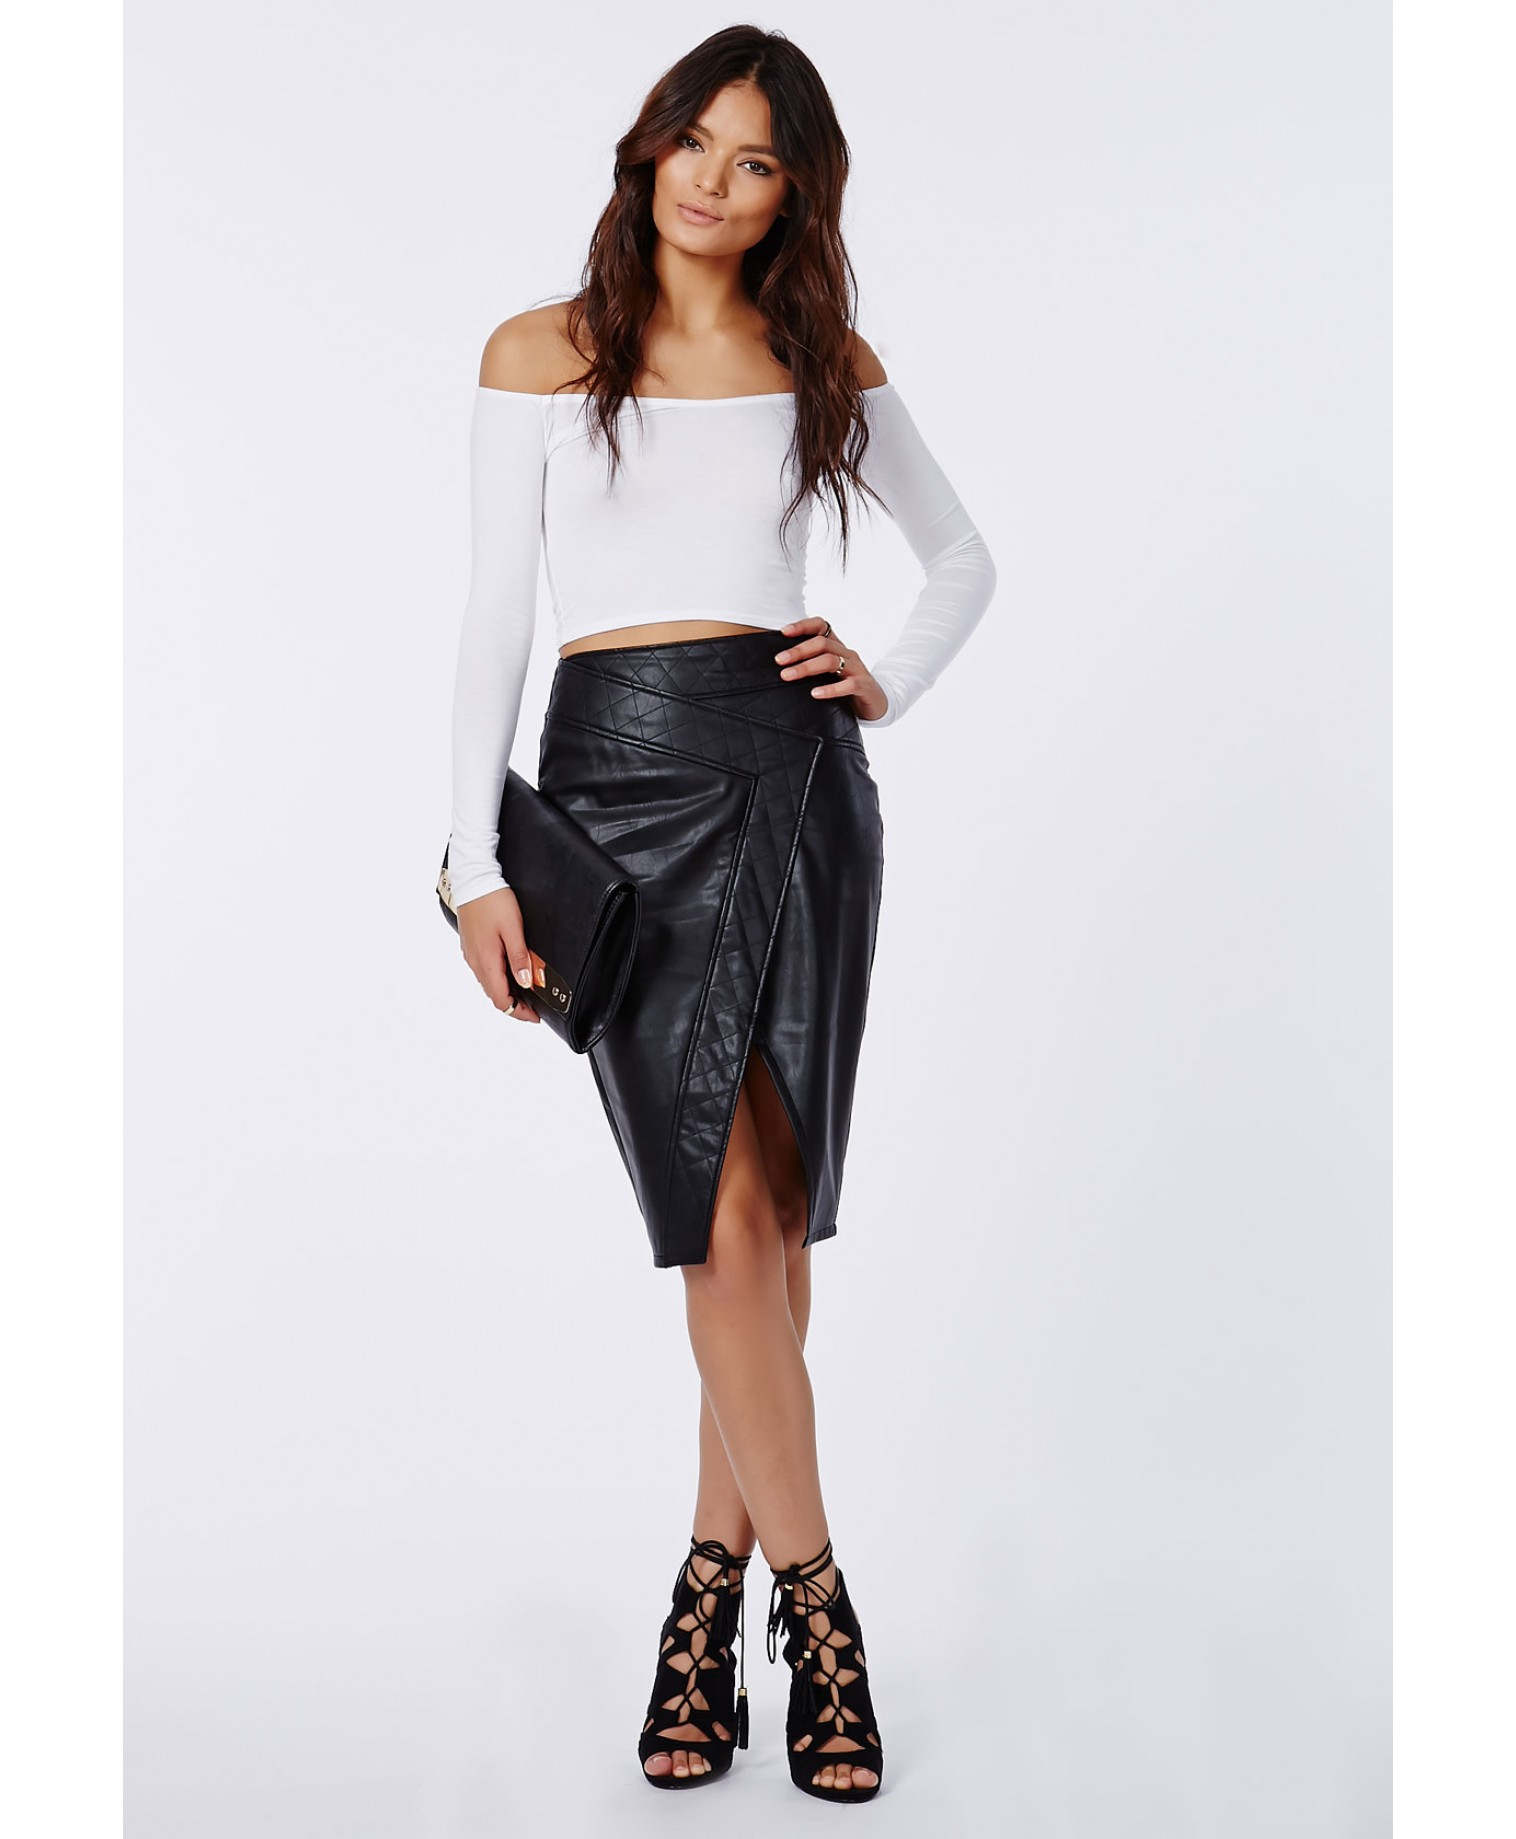 a6e756b3e5b65 Lyst - Missguided Carrisa Long Sleeve Jersey Bardot Crop Top White ...